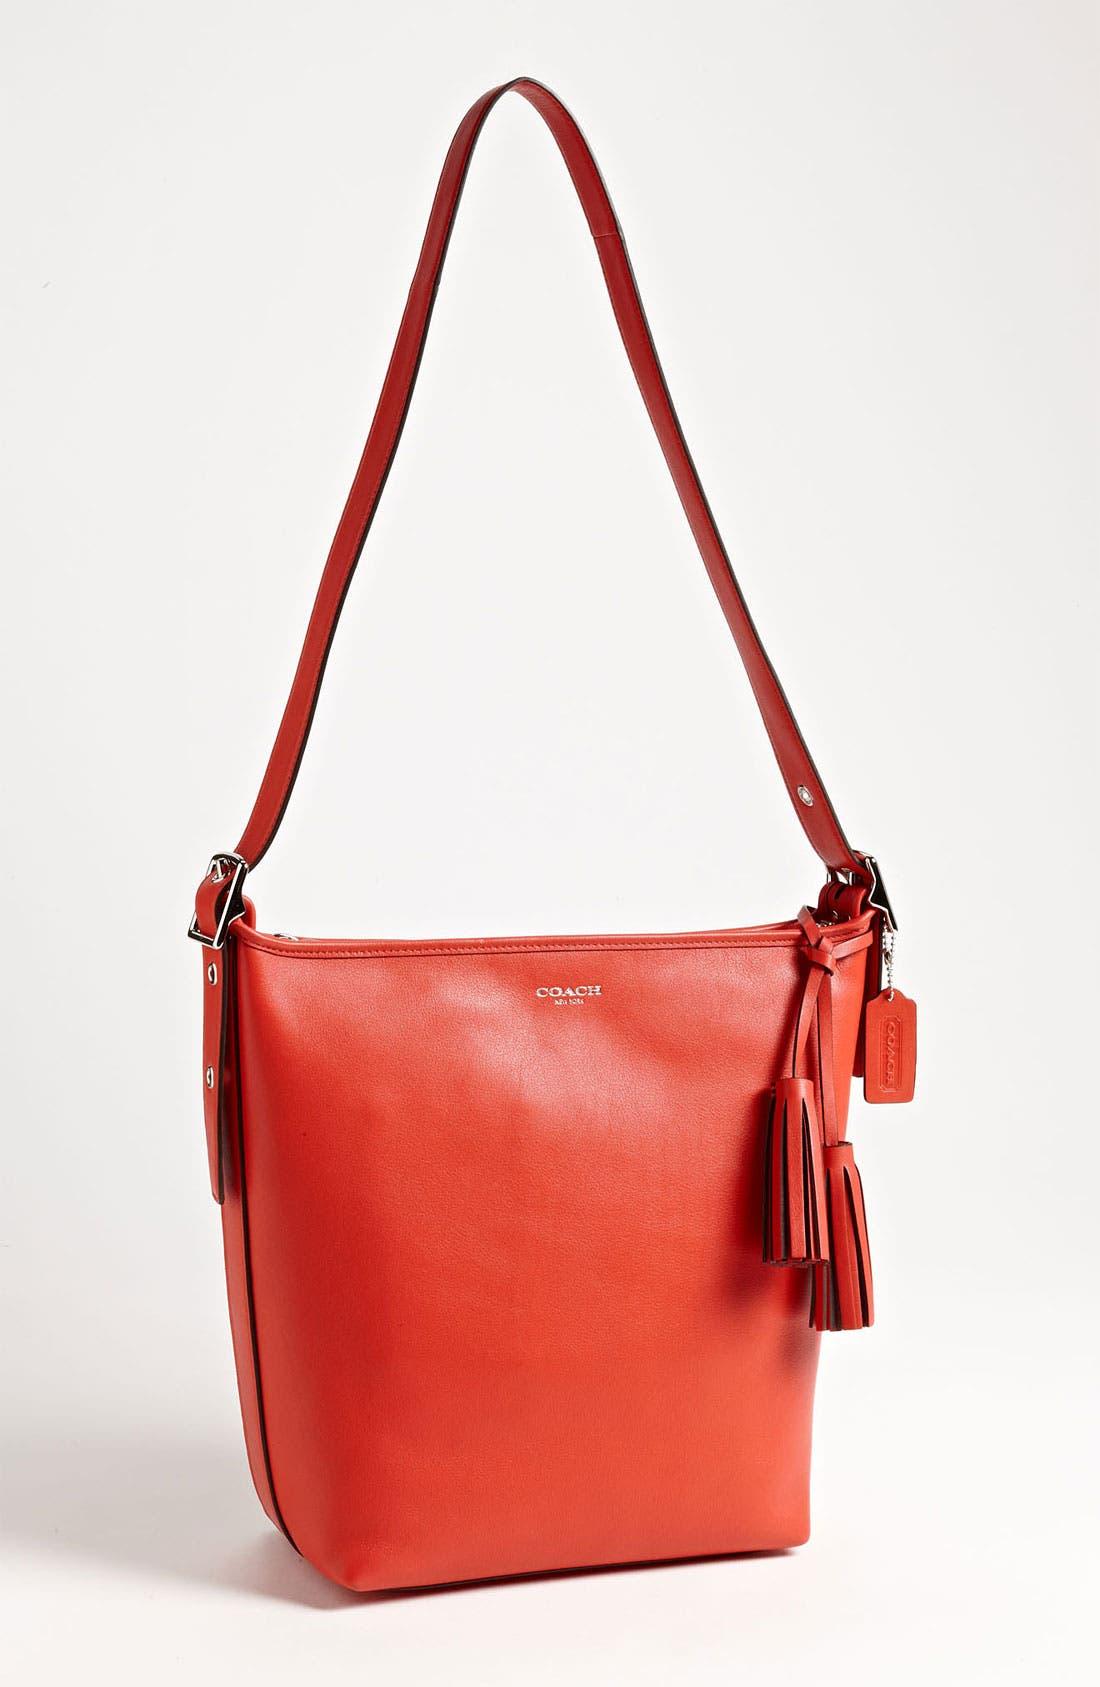 Alternate Image 1 Selected - COACH 'Legacy - Duffle' Tasseled Leather Shoulder Bag